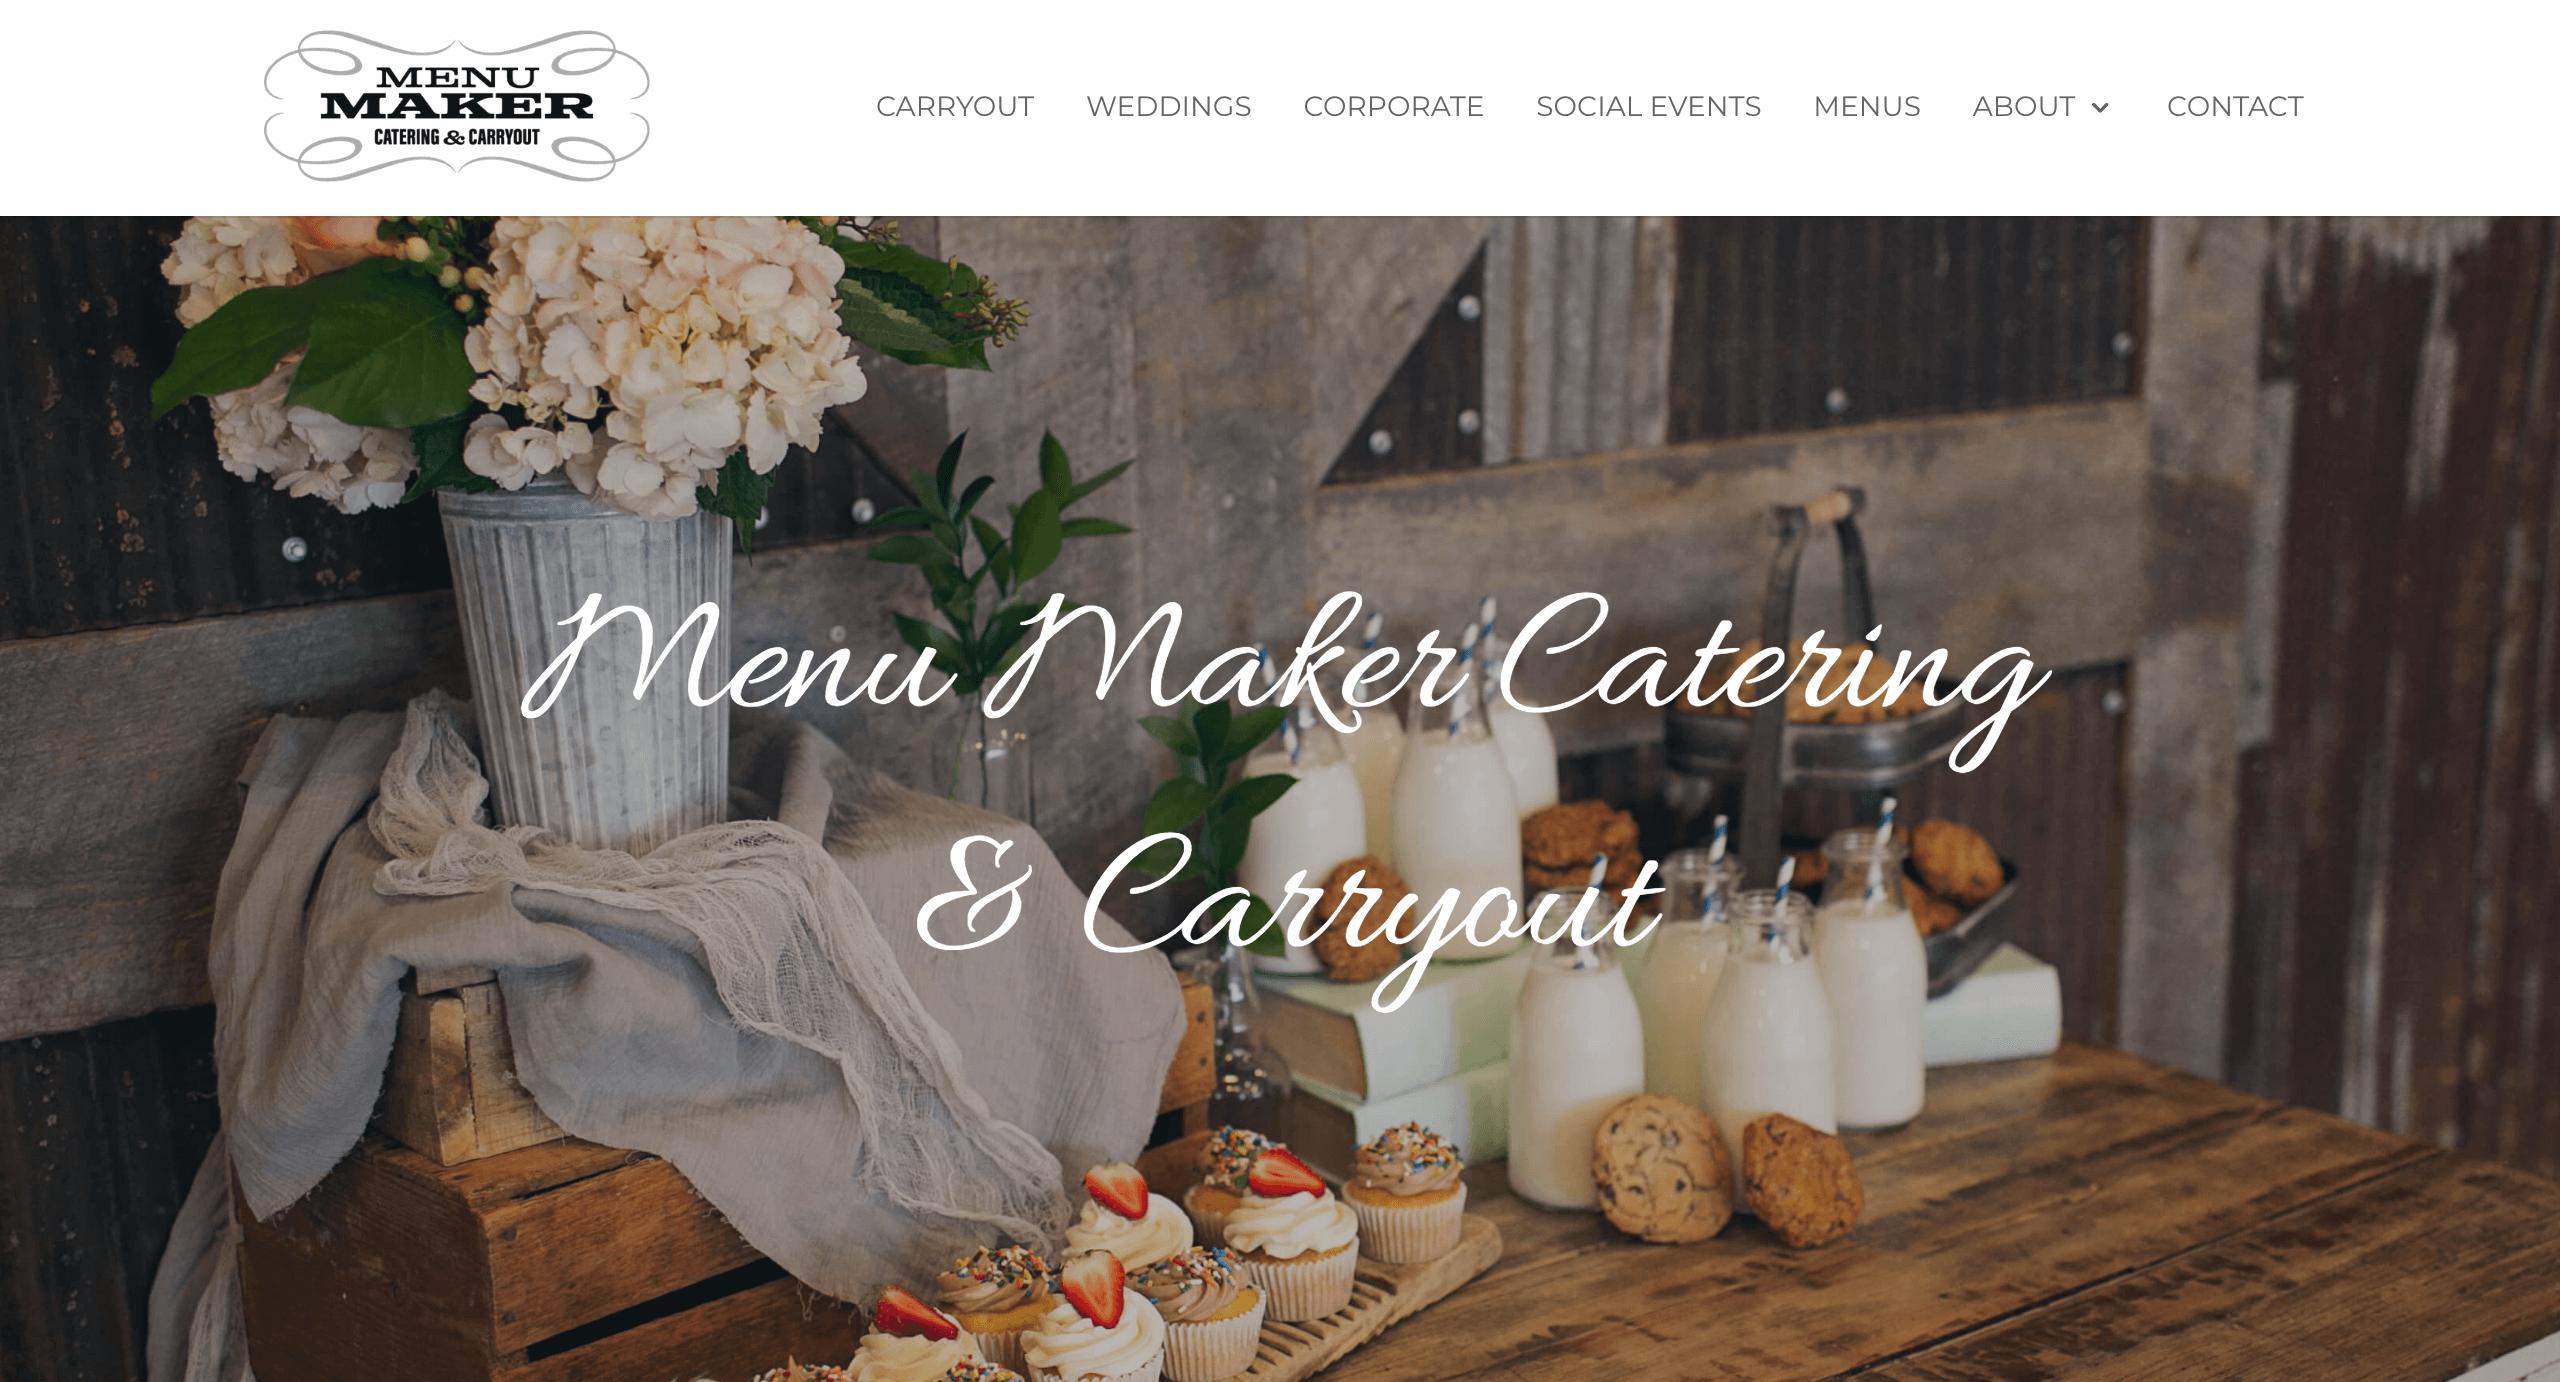 nashville s menu maker catering about us